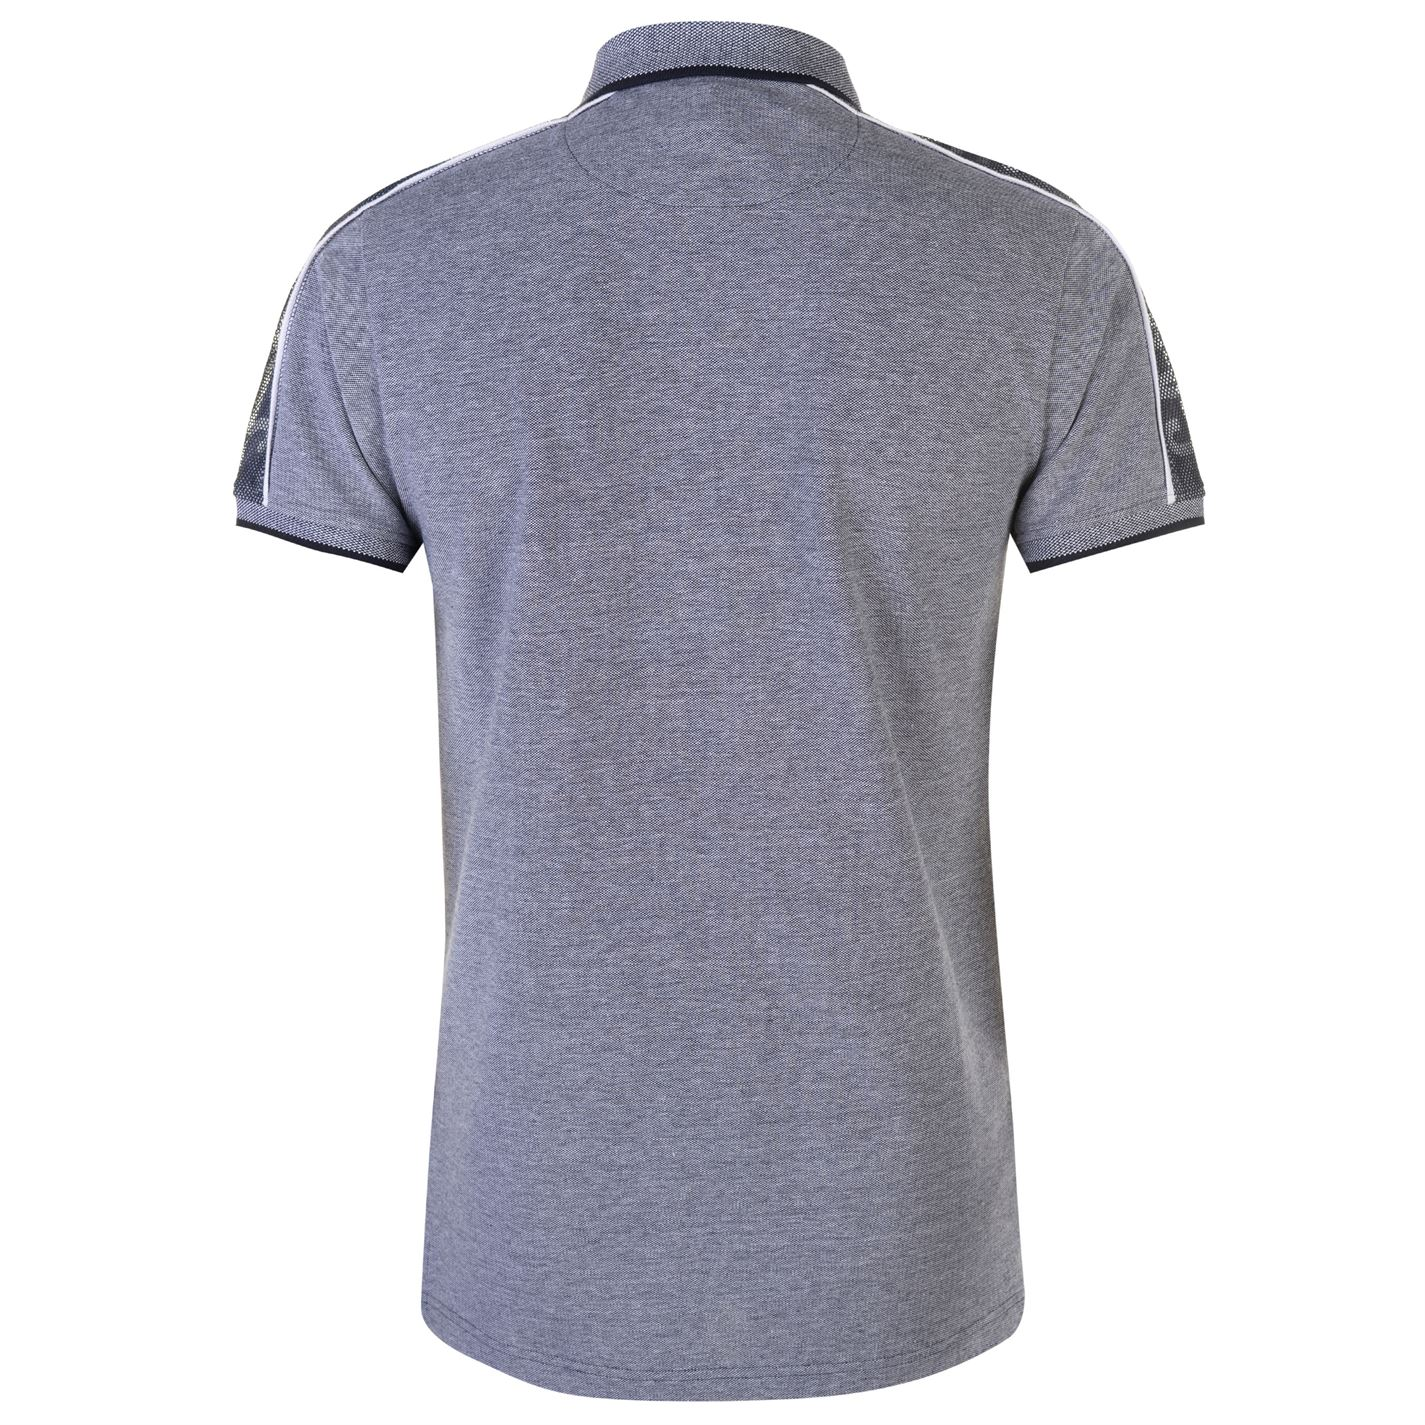 Mens SoulCal Birdseye Polo Shirt Slim Fit Short Sleeve New